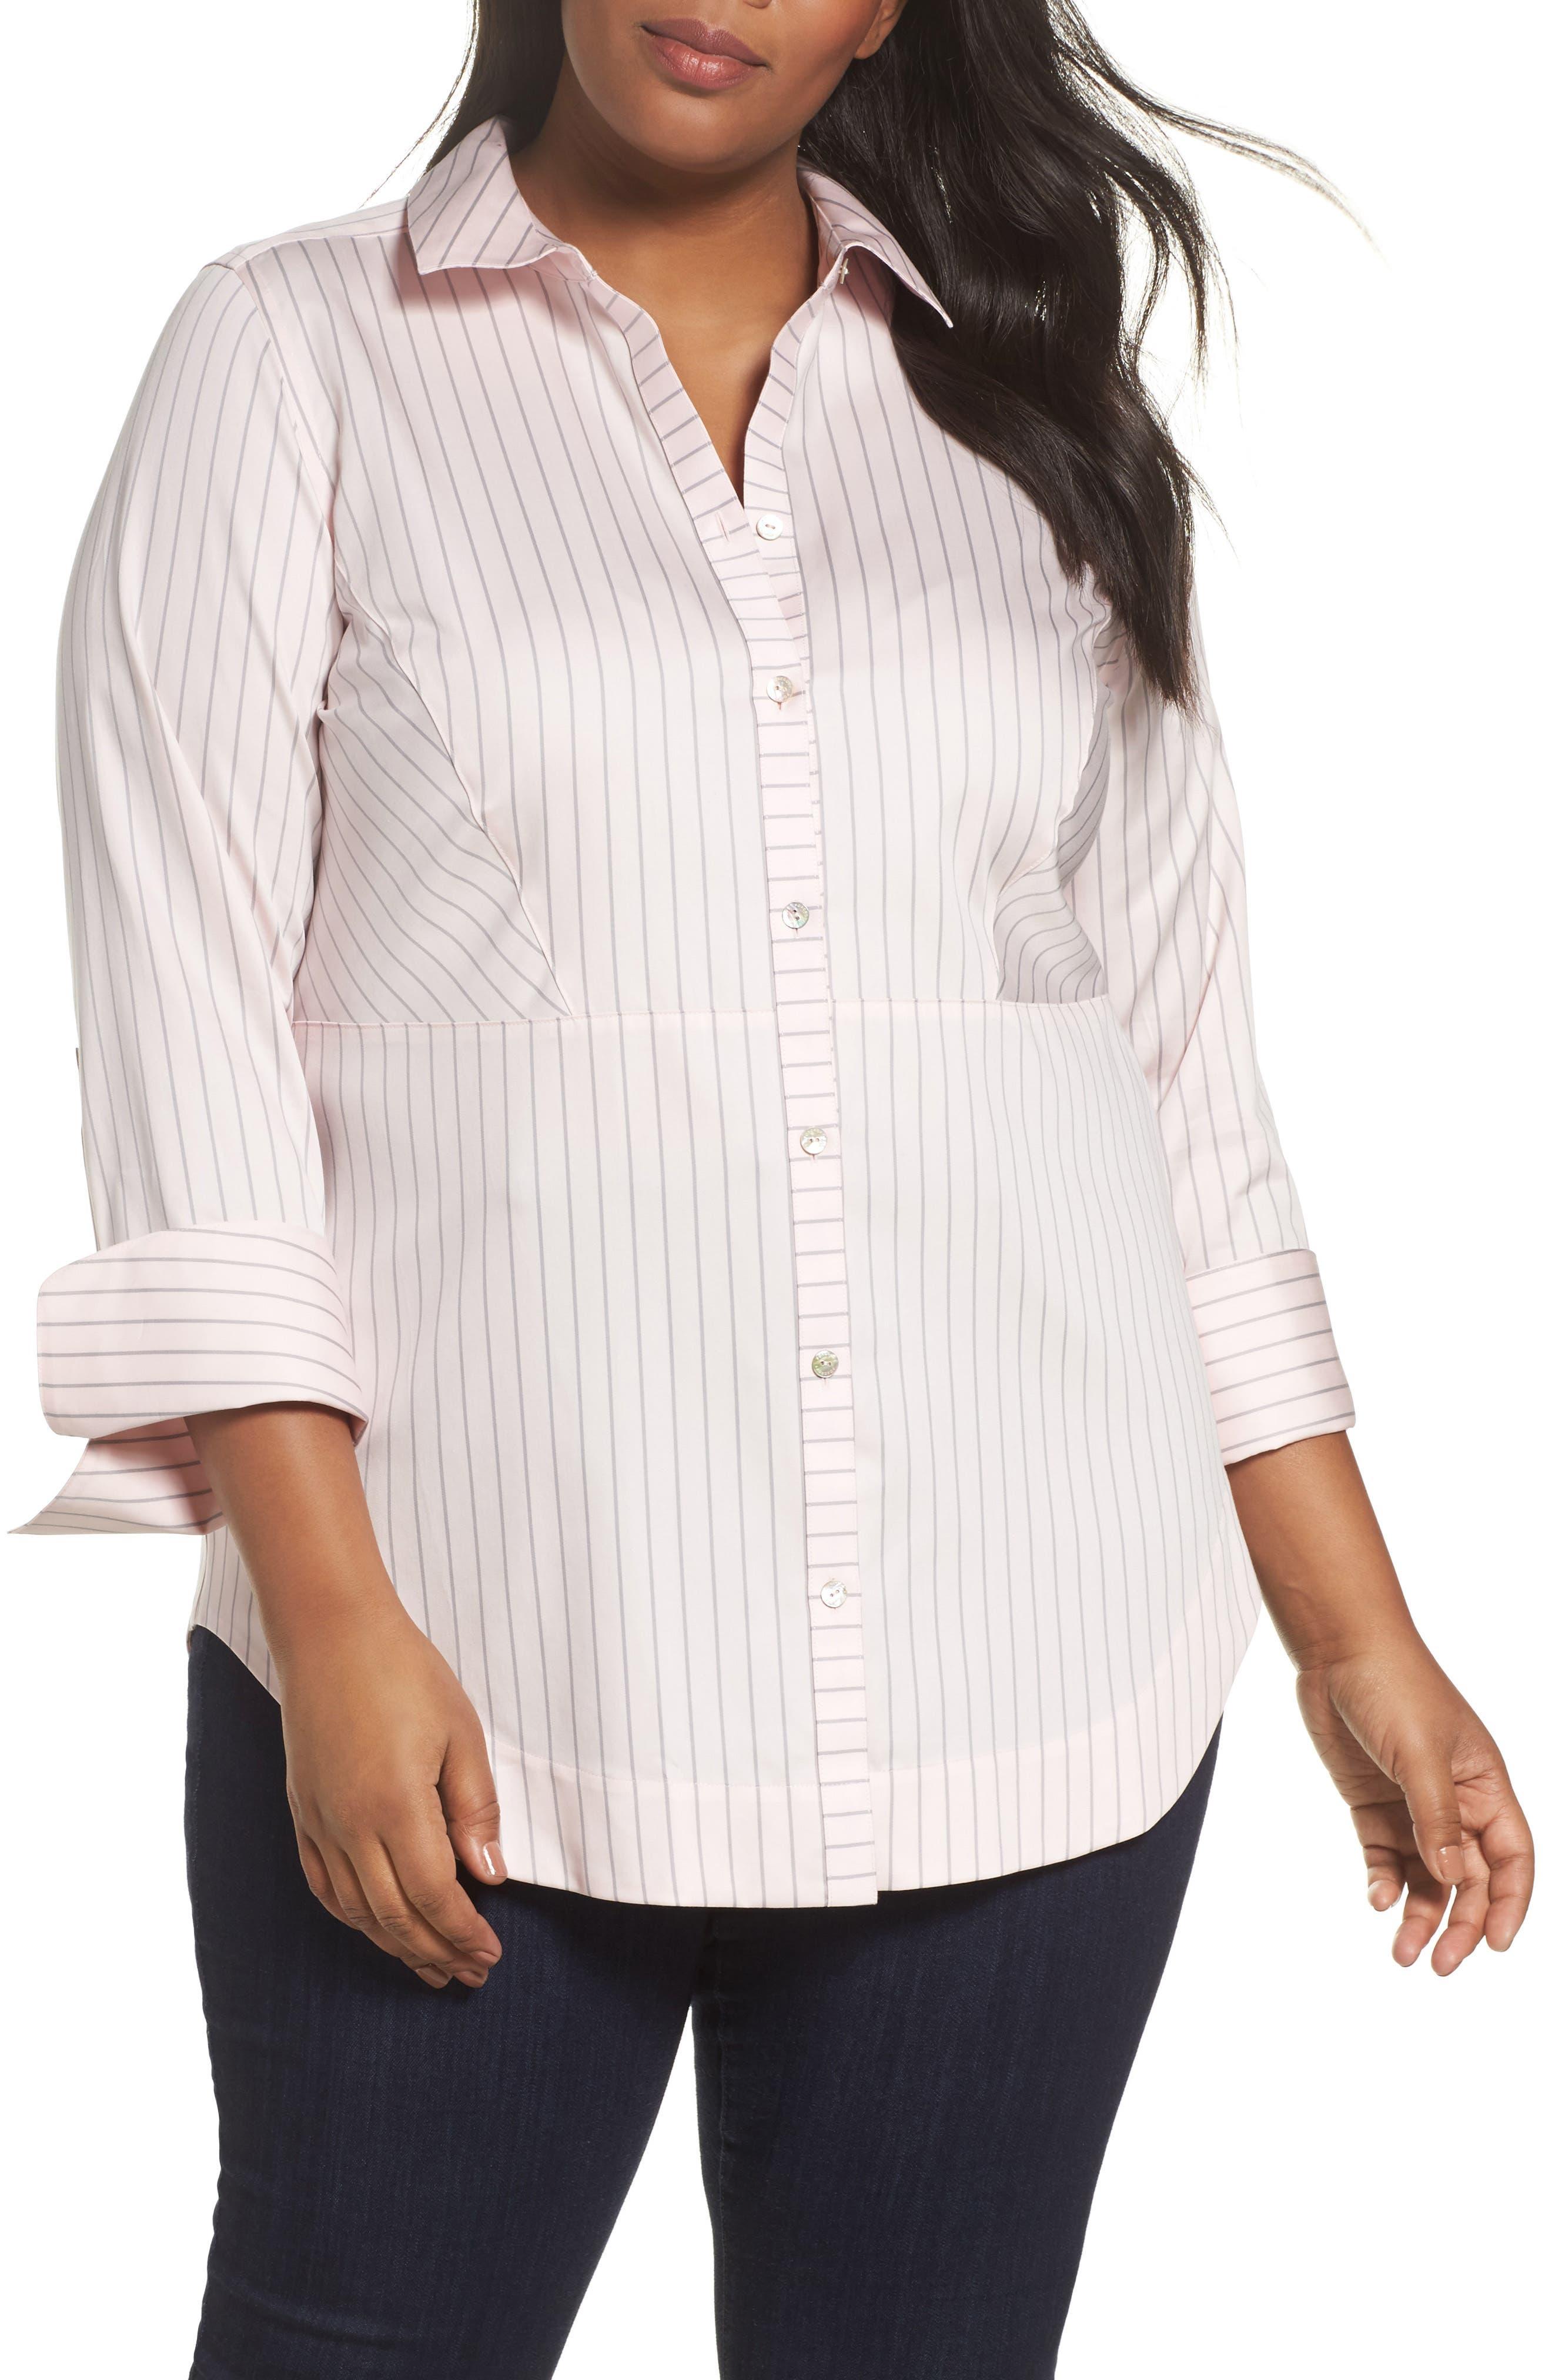 Alternate Image 1 Selected - Foxcroft Patrice Classic Stripe Shirt (Plus Size)